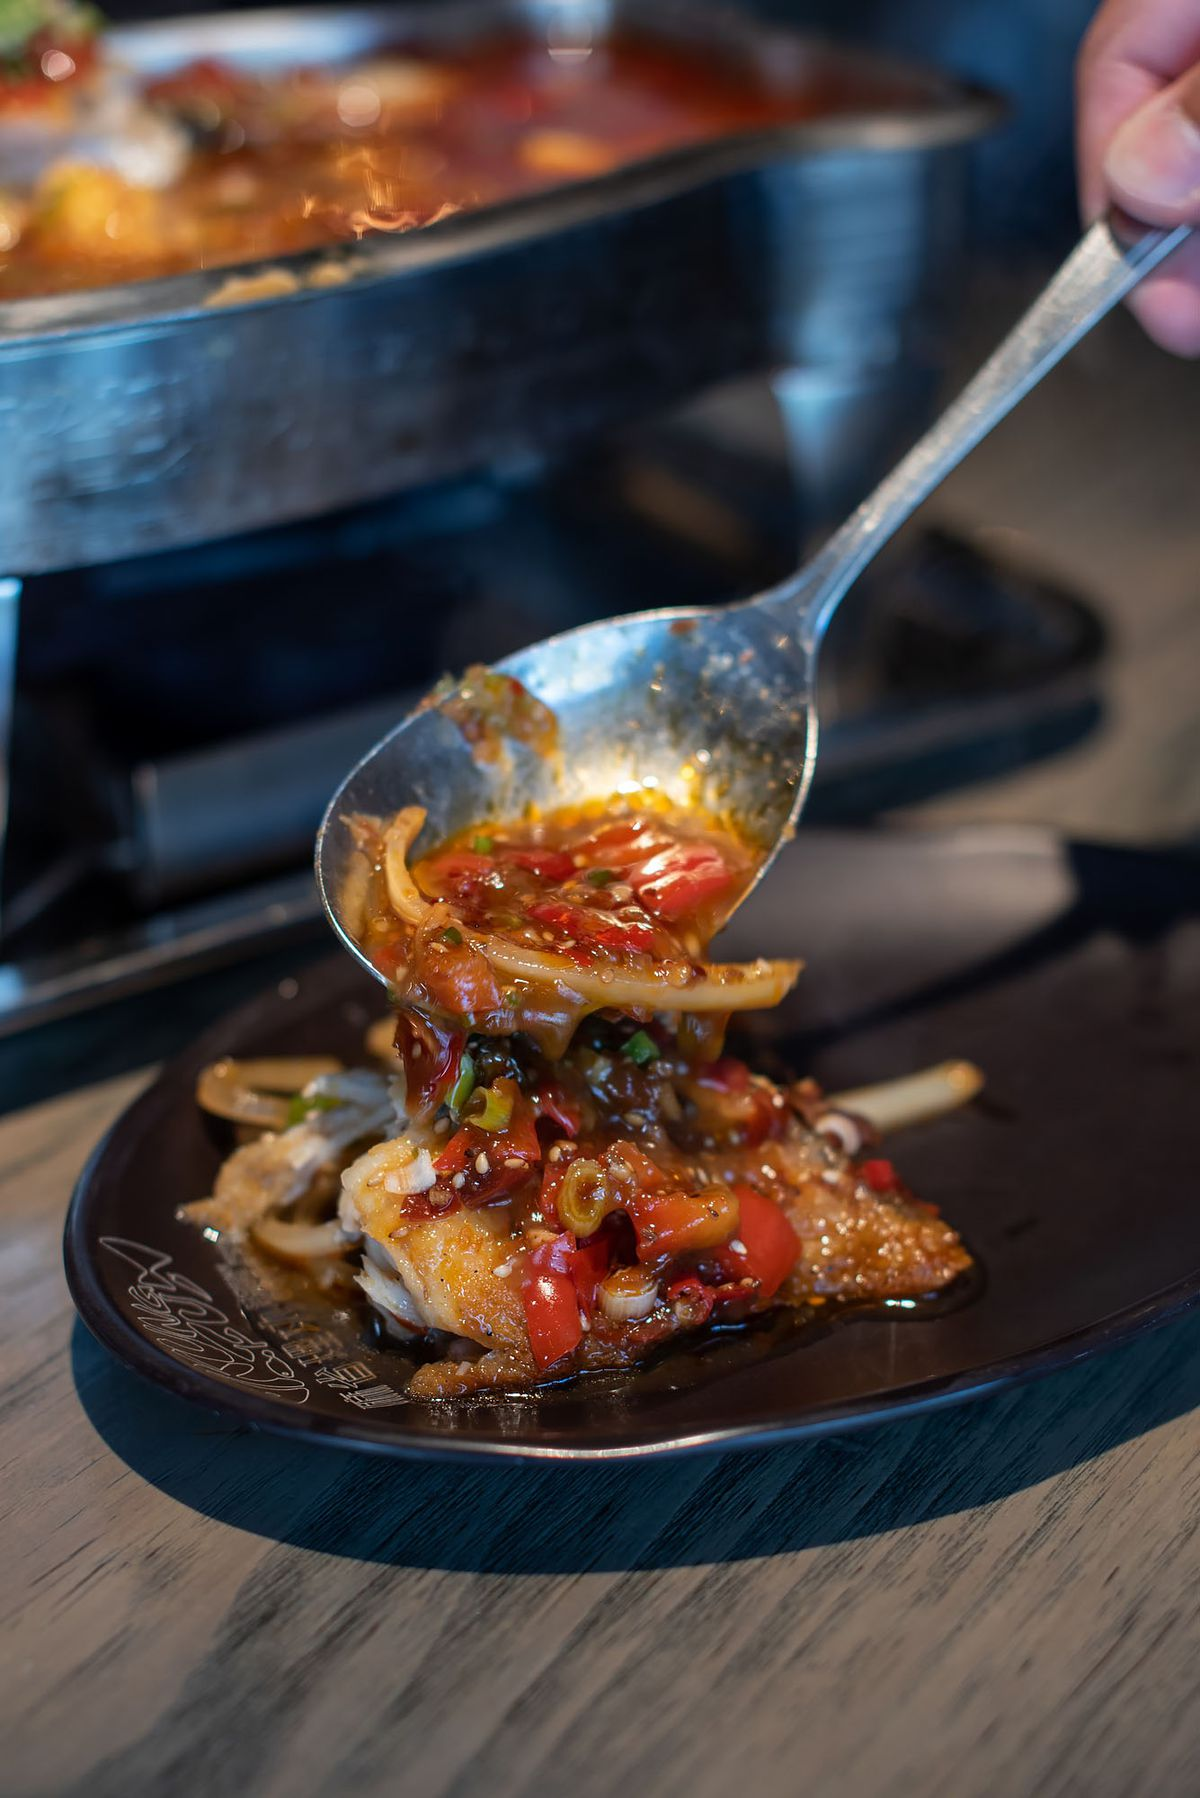 Pan-roasted black cod at Sichuan Kungfu Fish